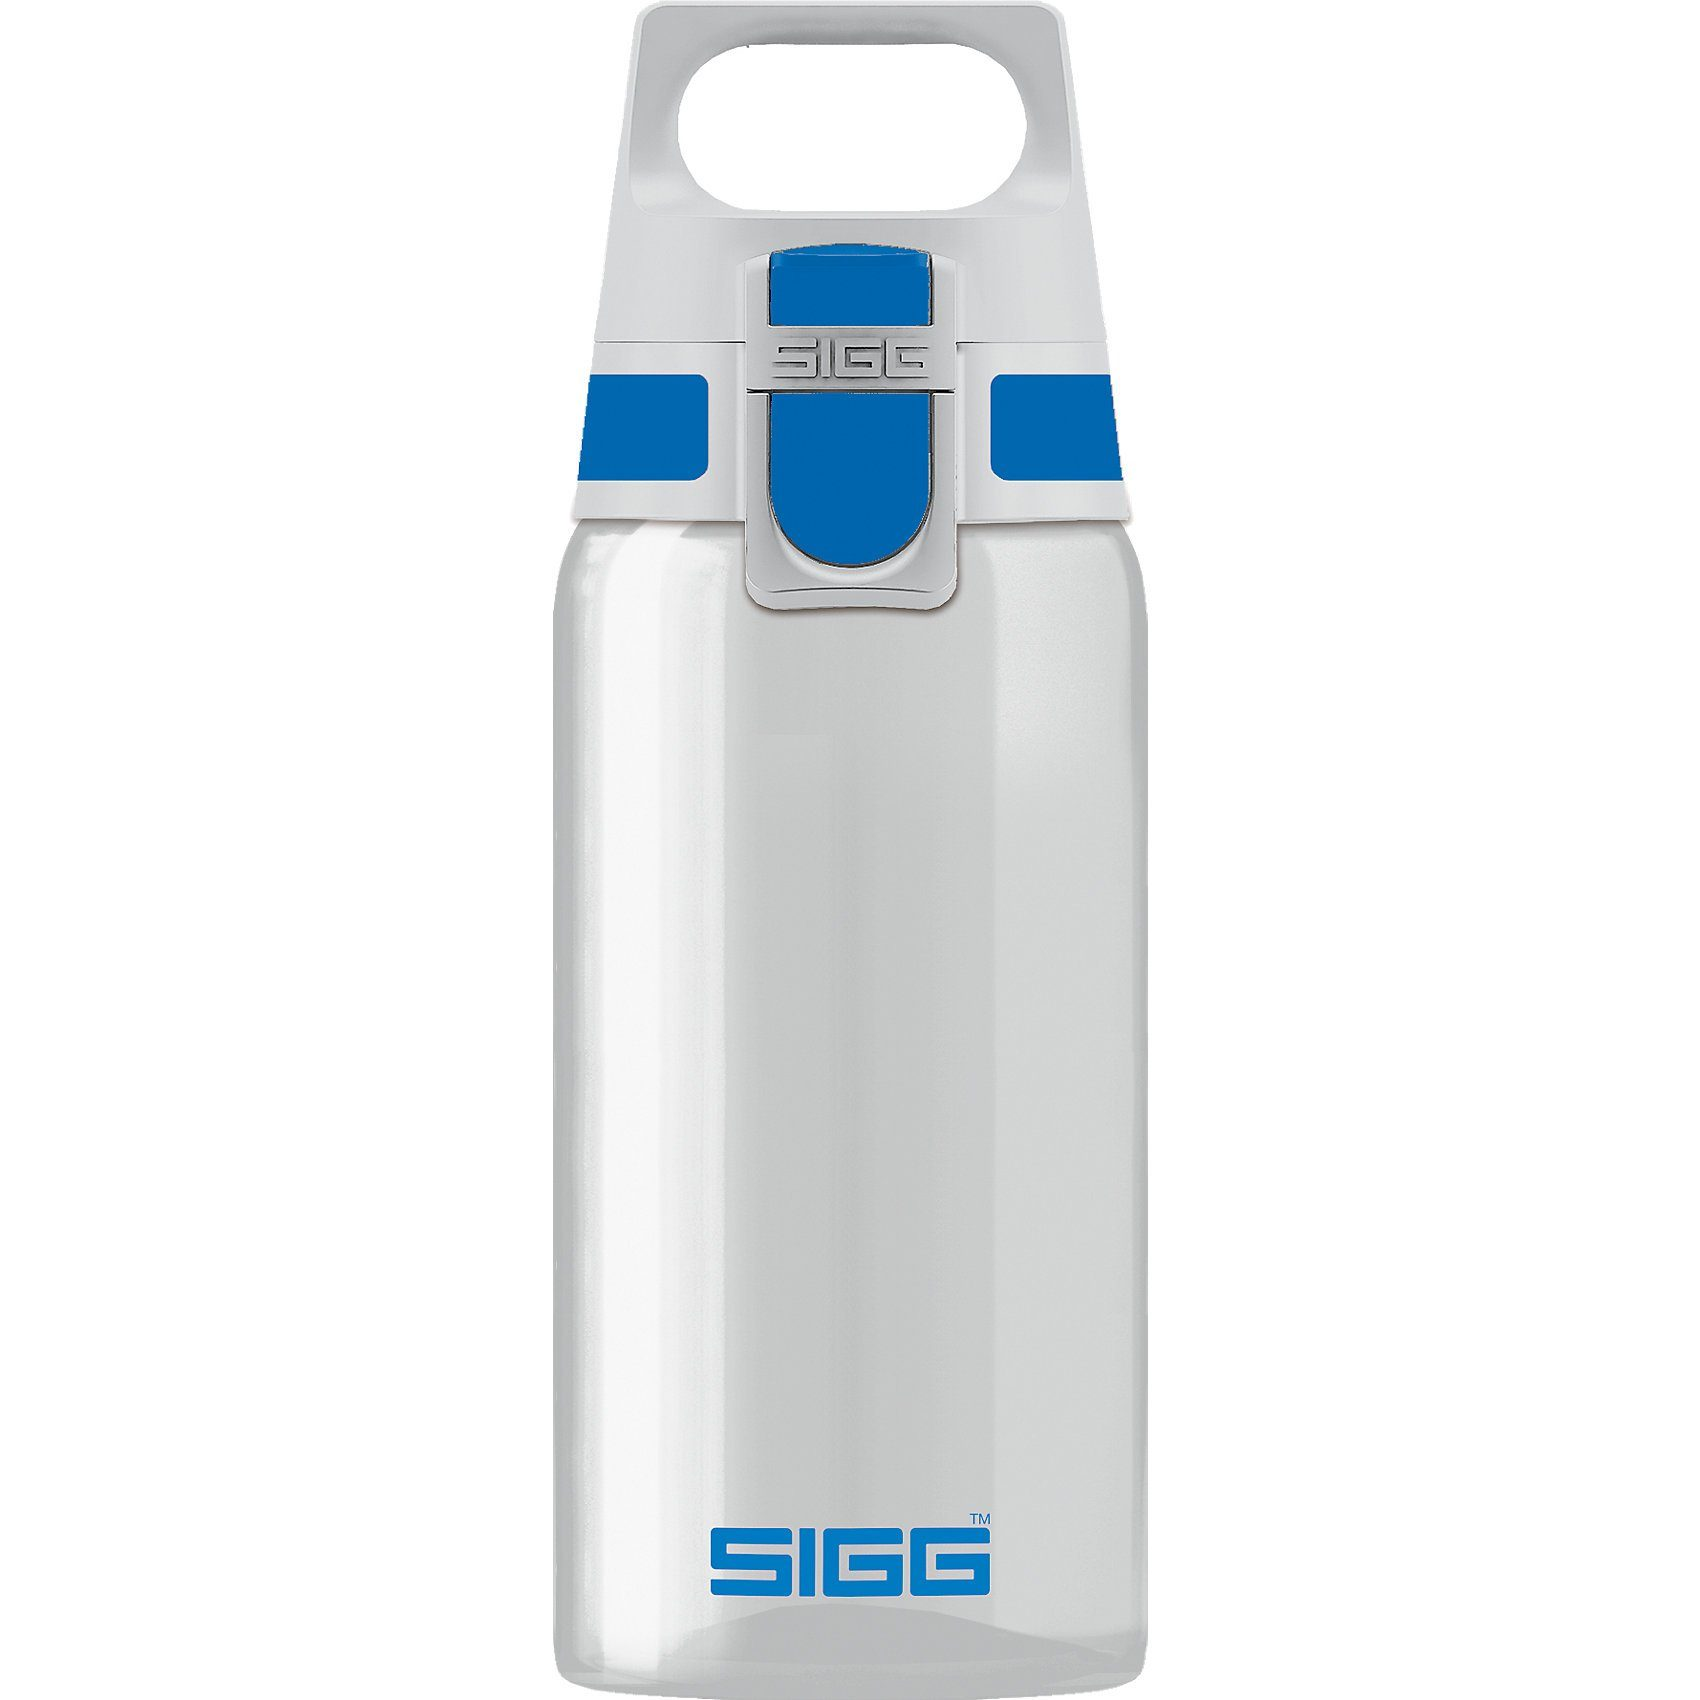 Sigg Tritan-Trinkflasche TOTAL CLEAR ONE Blue, 500 ml